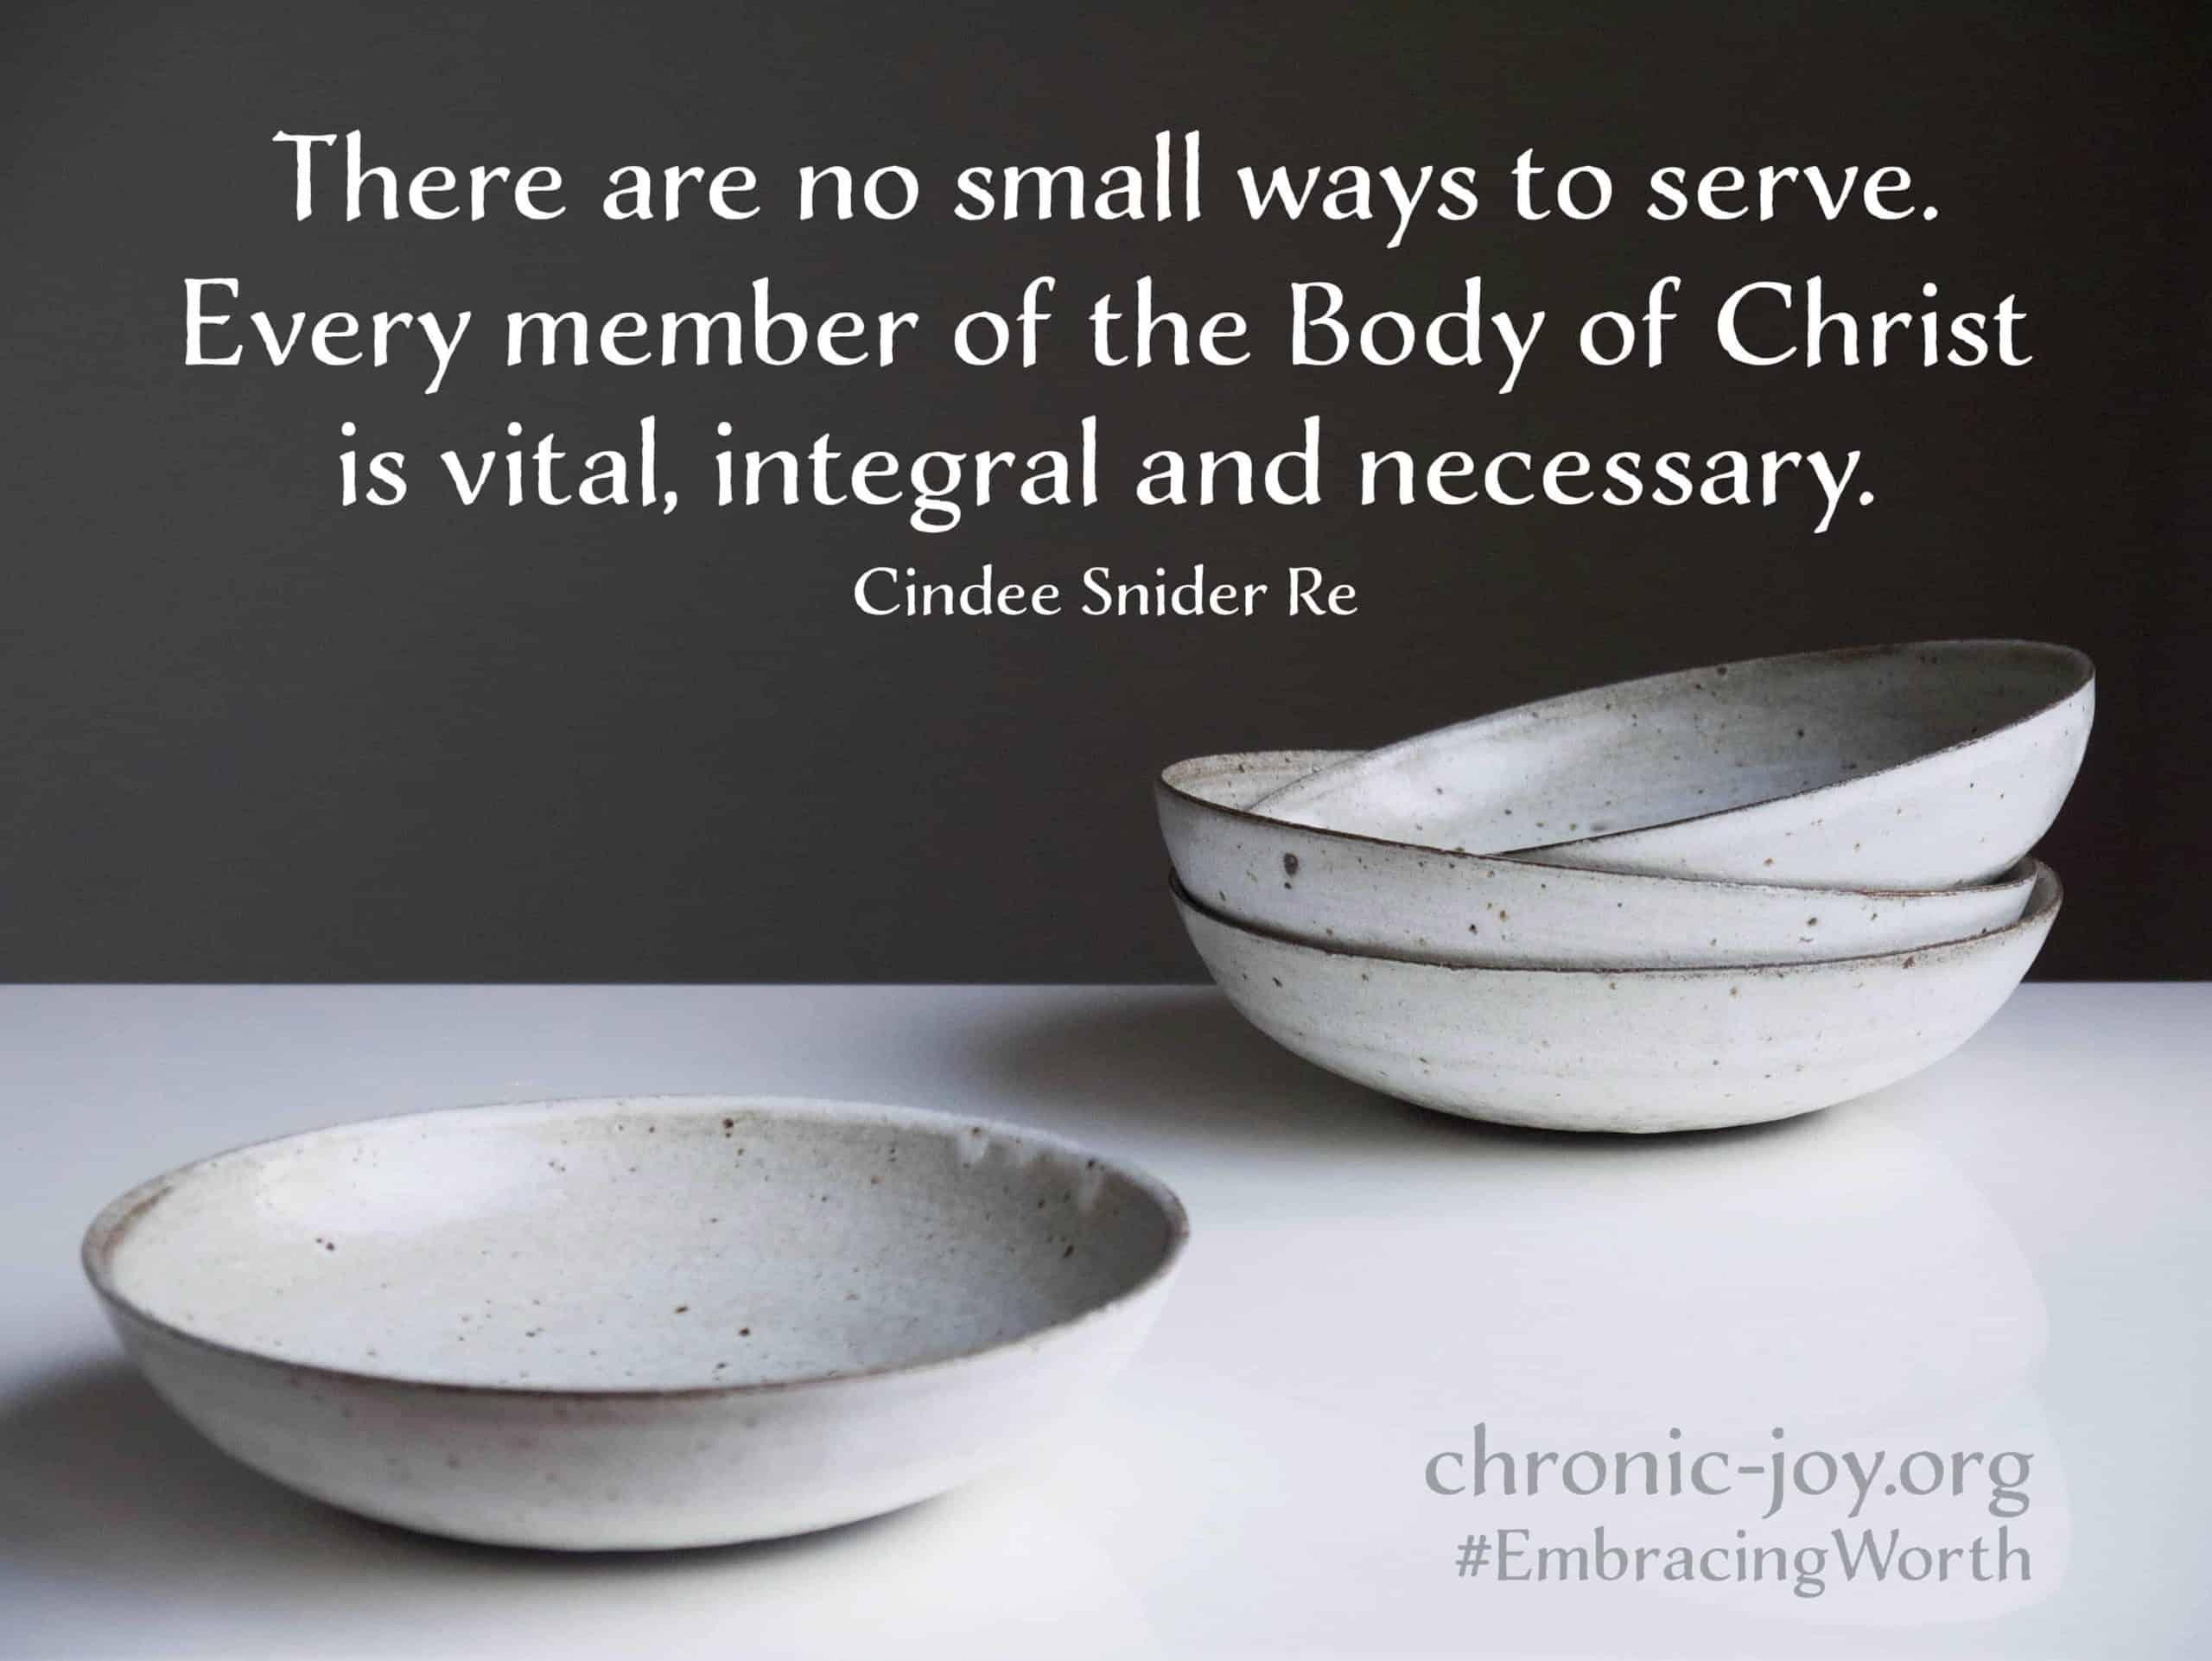 No small way to serve